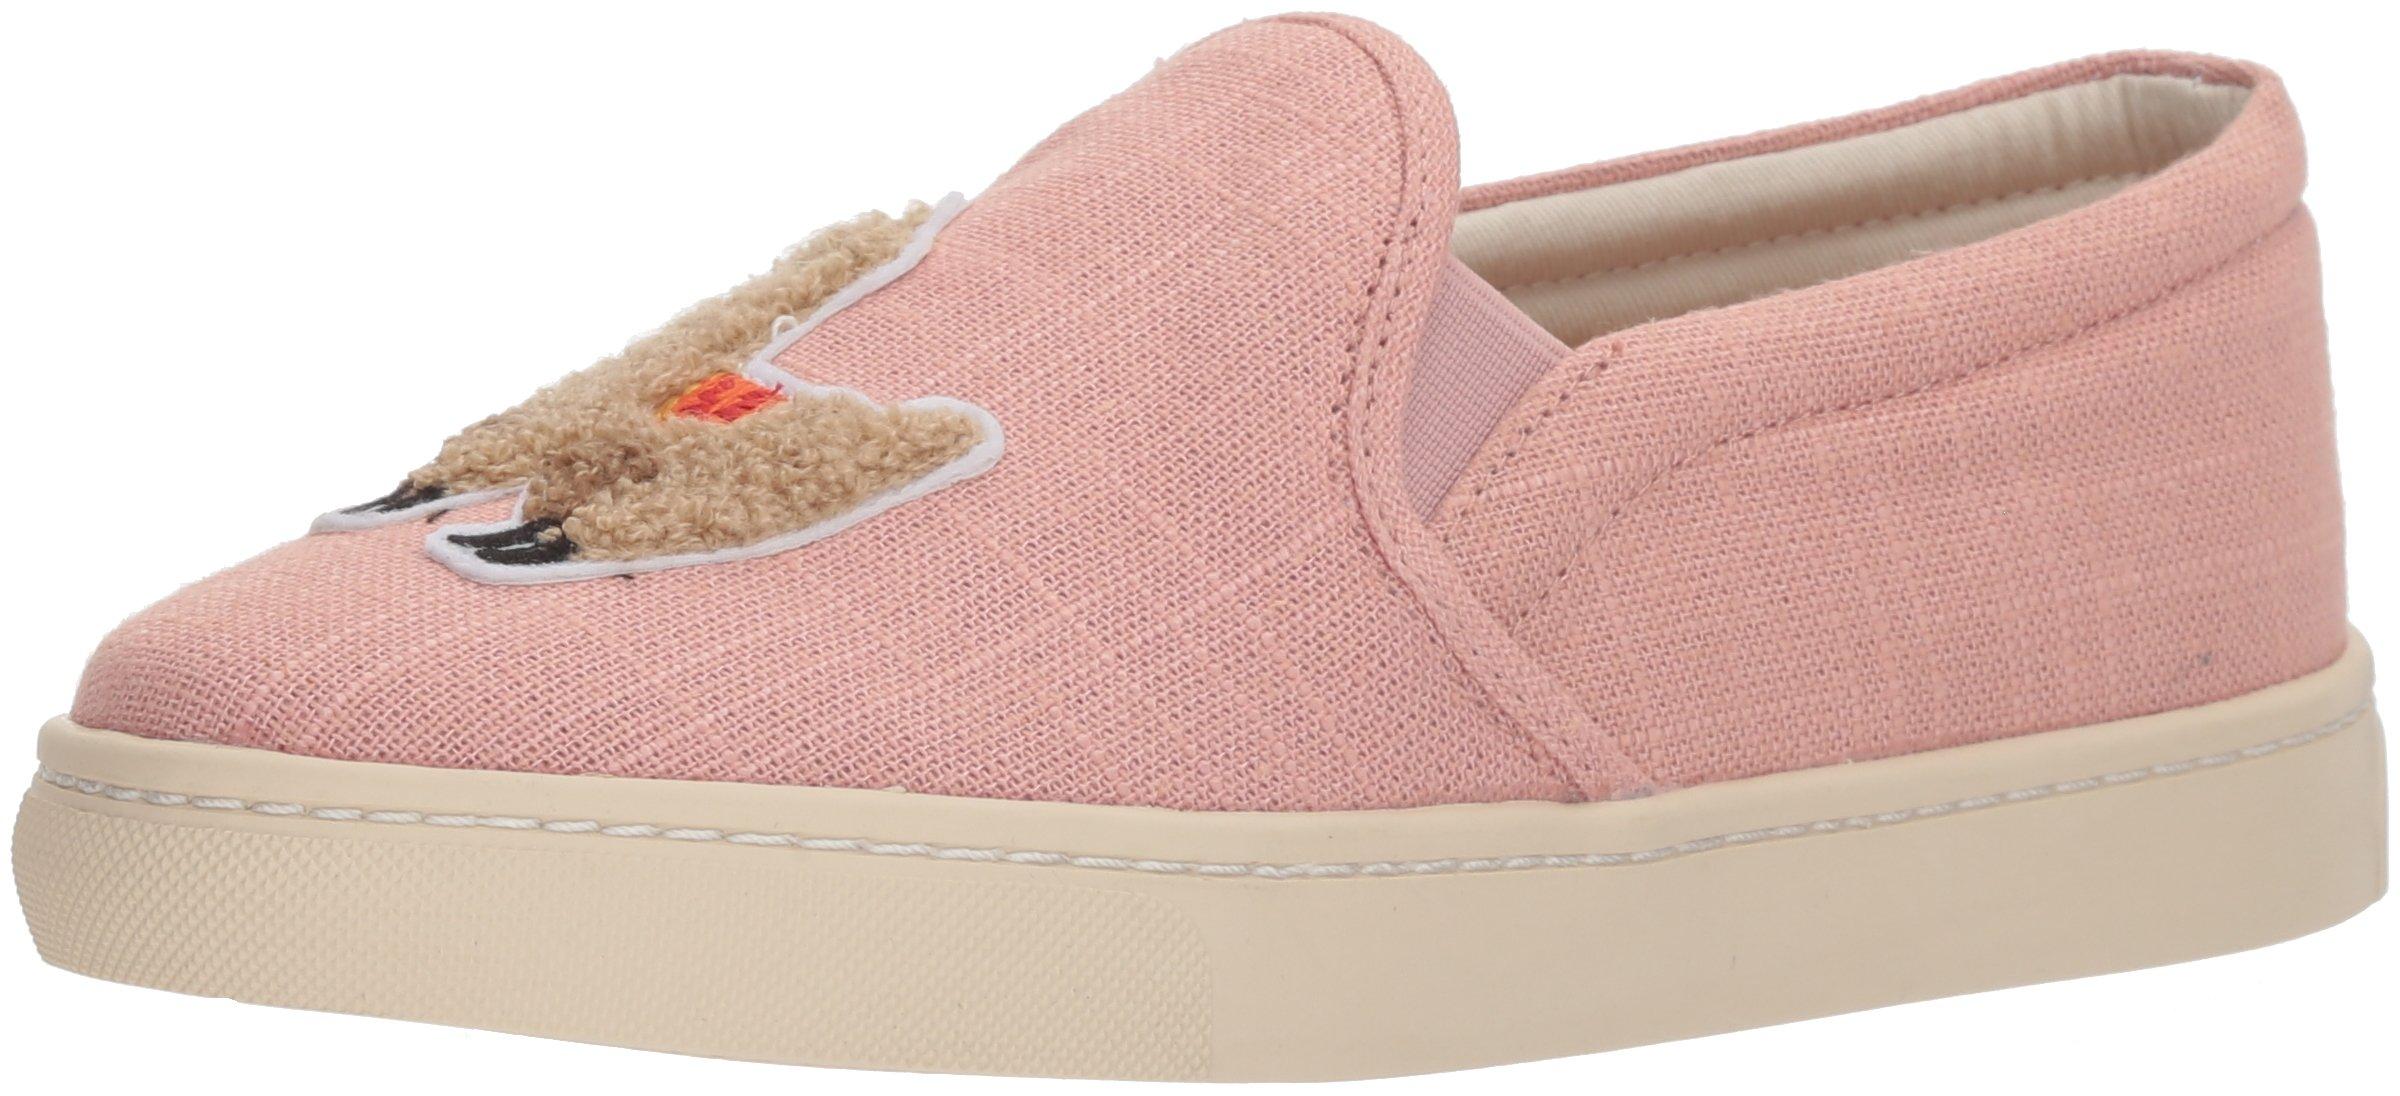 Soludos Women's Llama Slip Sneaker, Dusty Rose, 9 Regular US